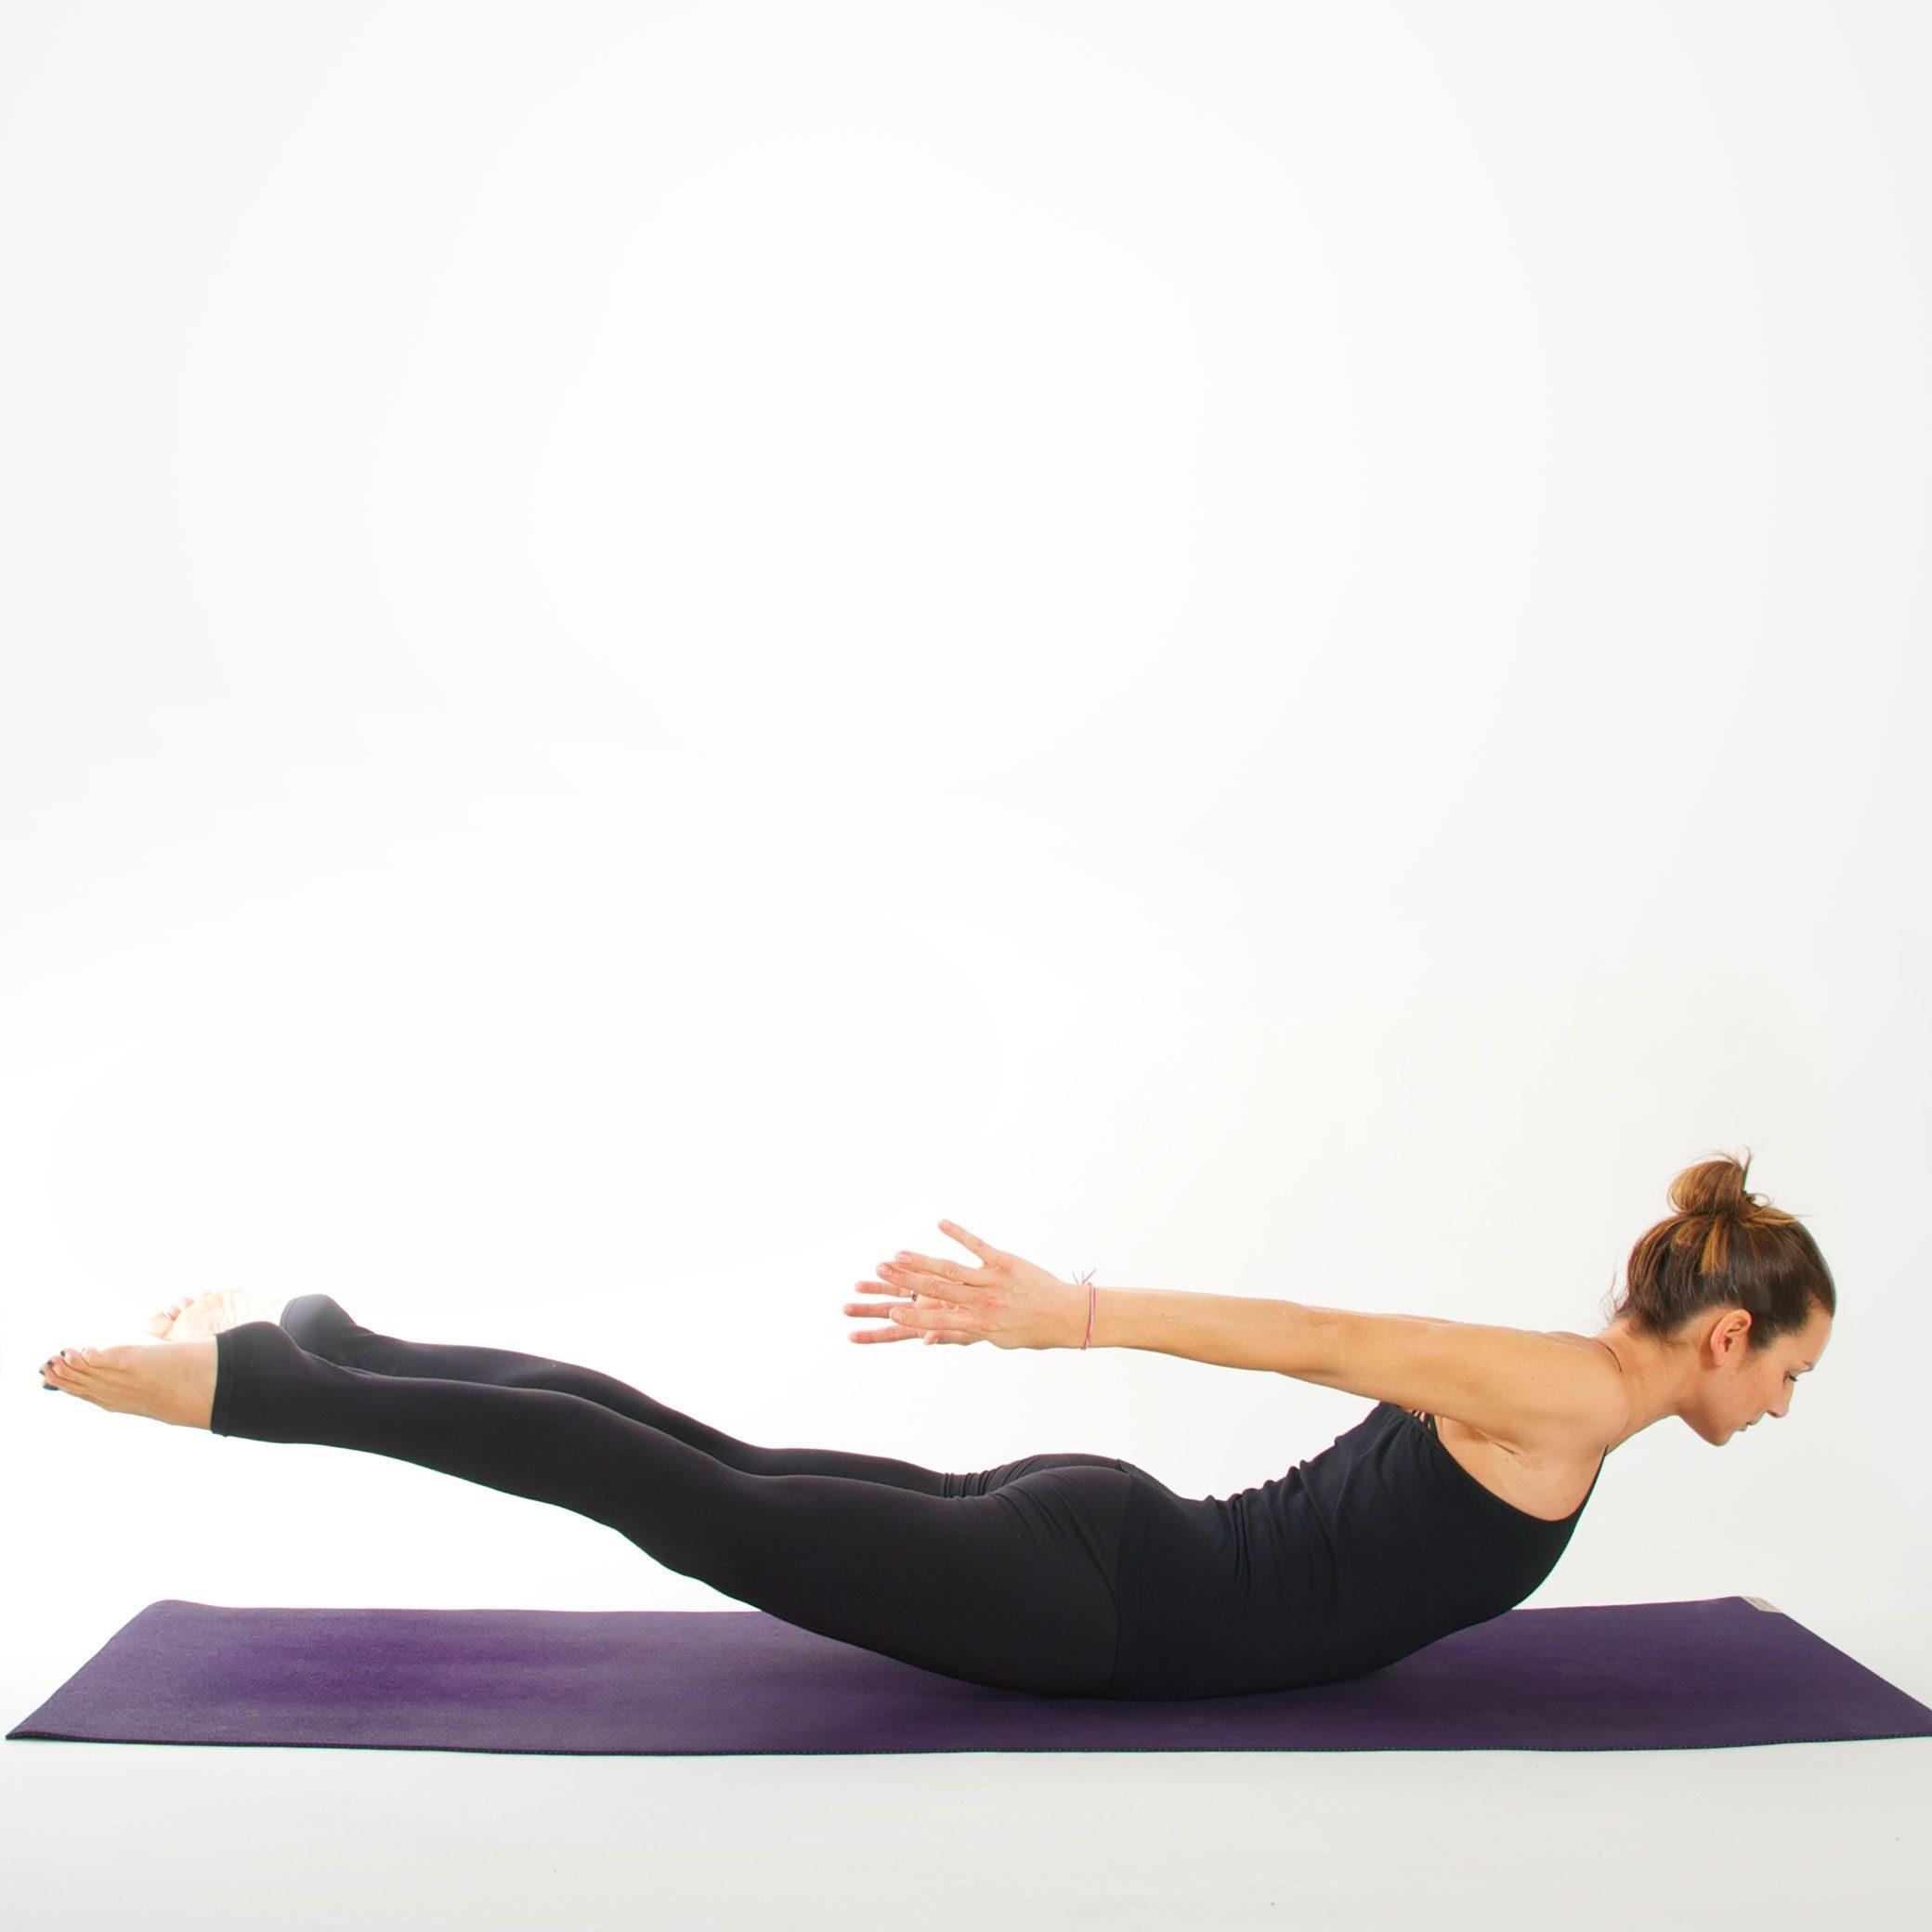 Yoga Asana I HEUSCHRECKE I myyogaflows